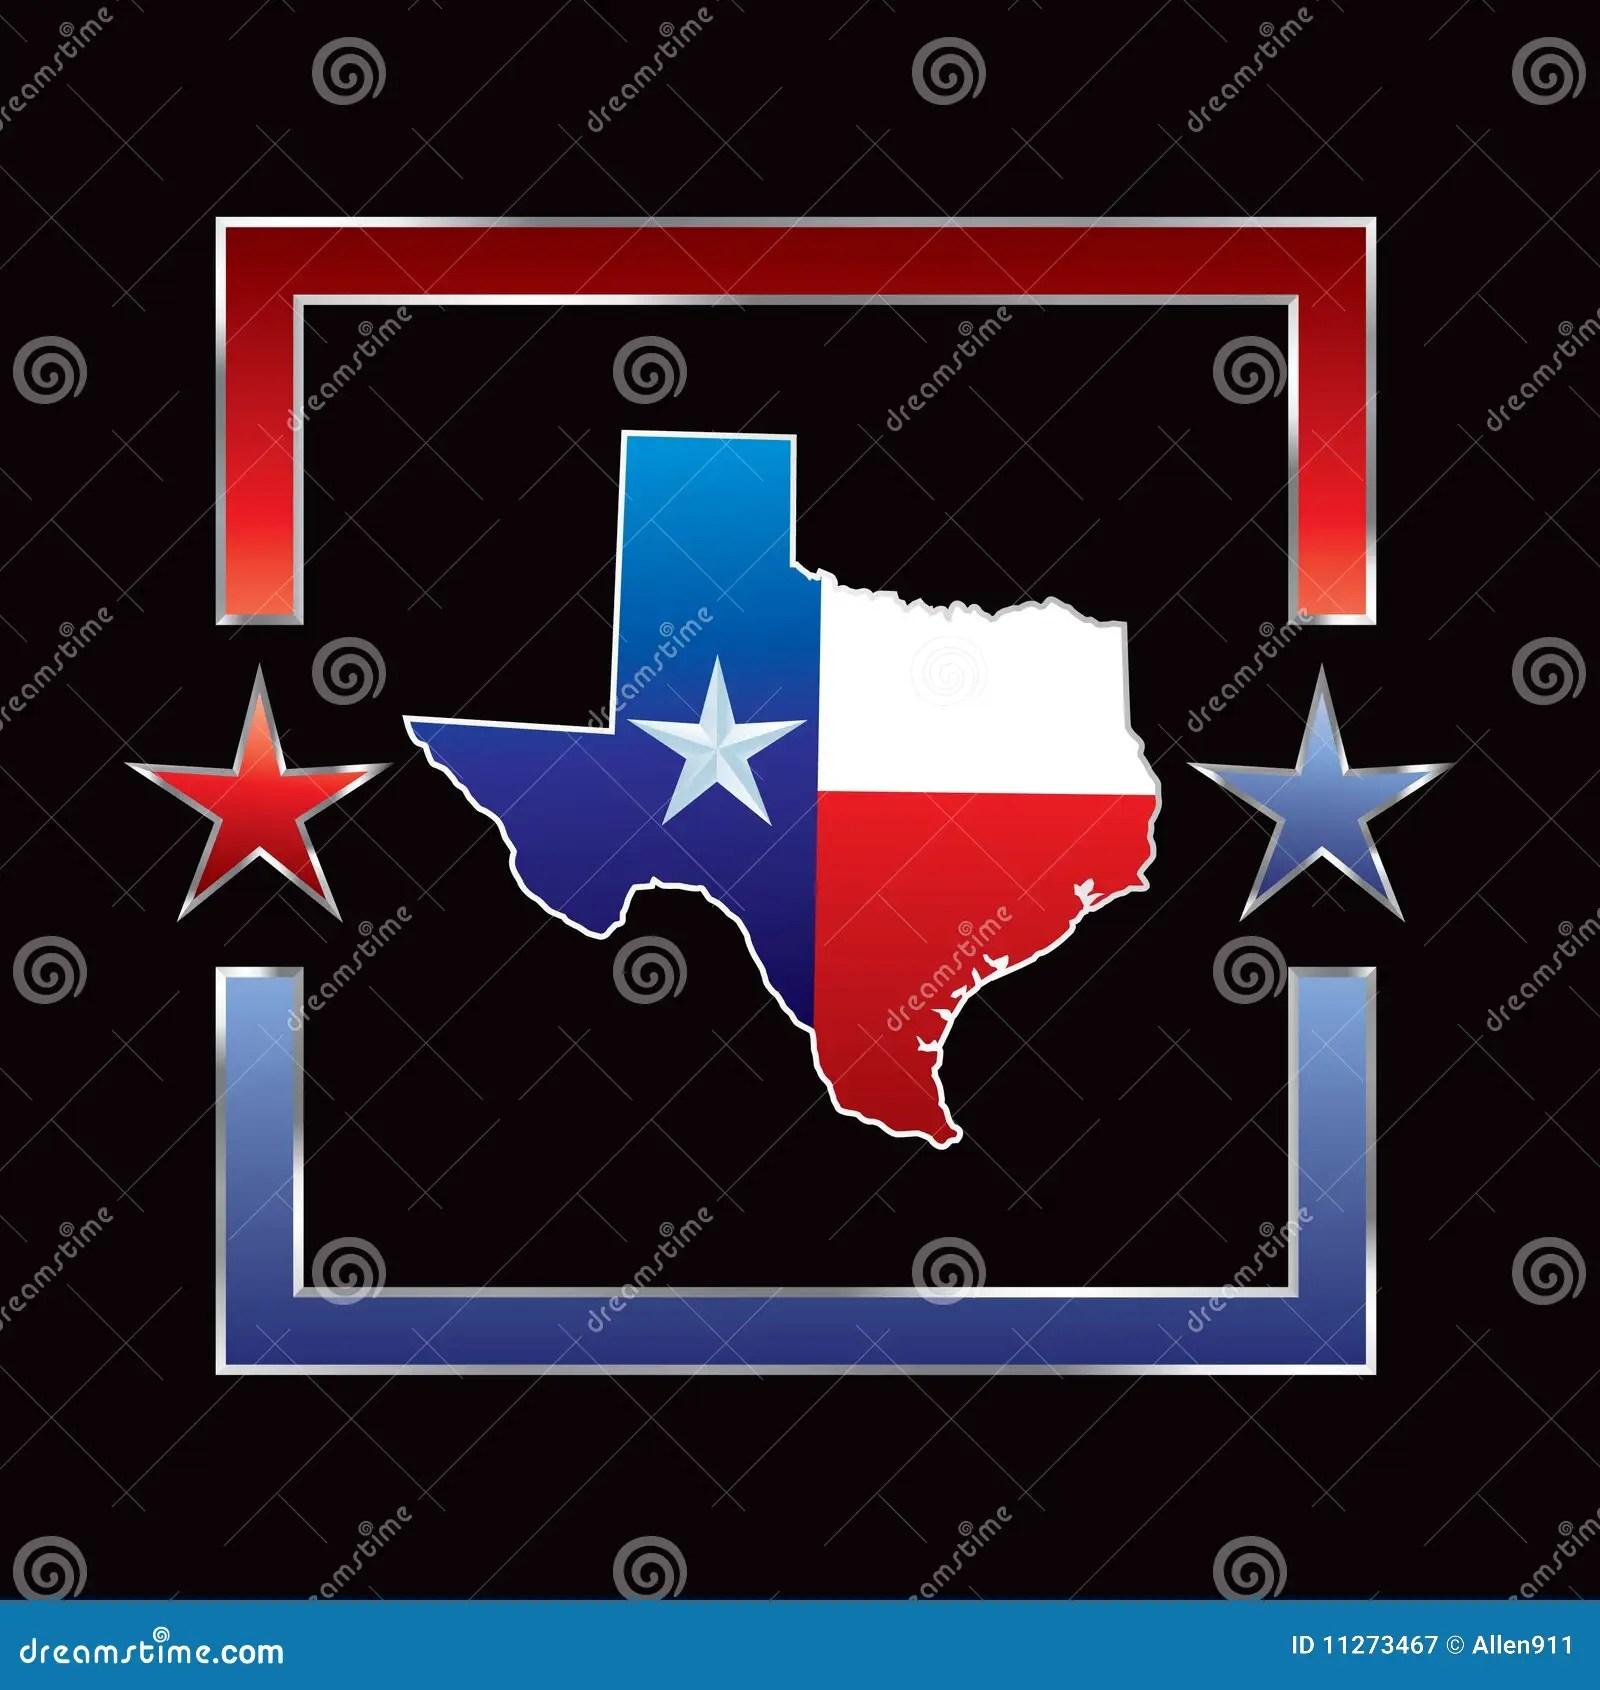 United Way Houston Texas